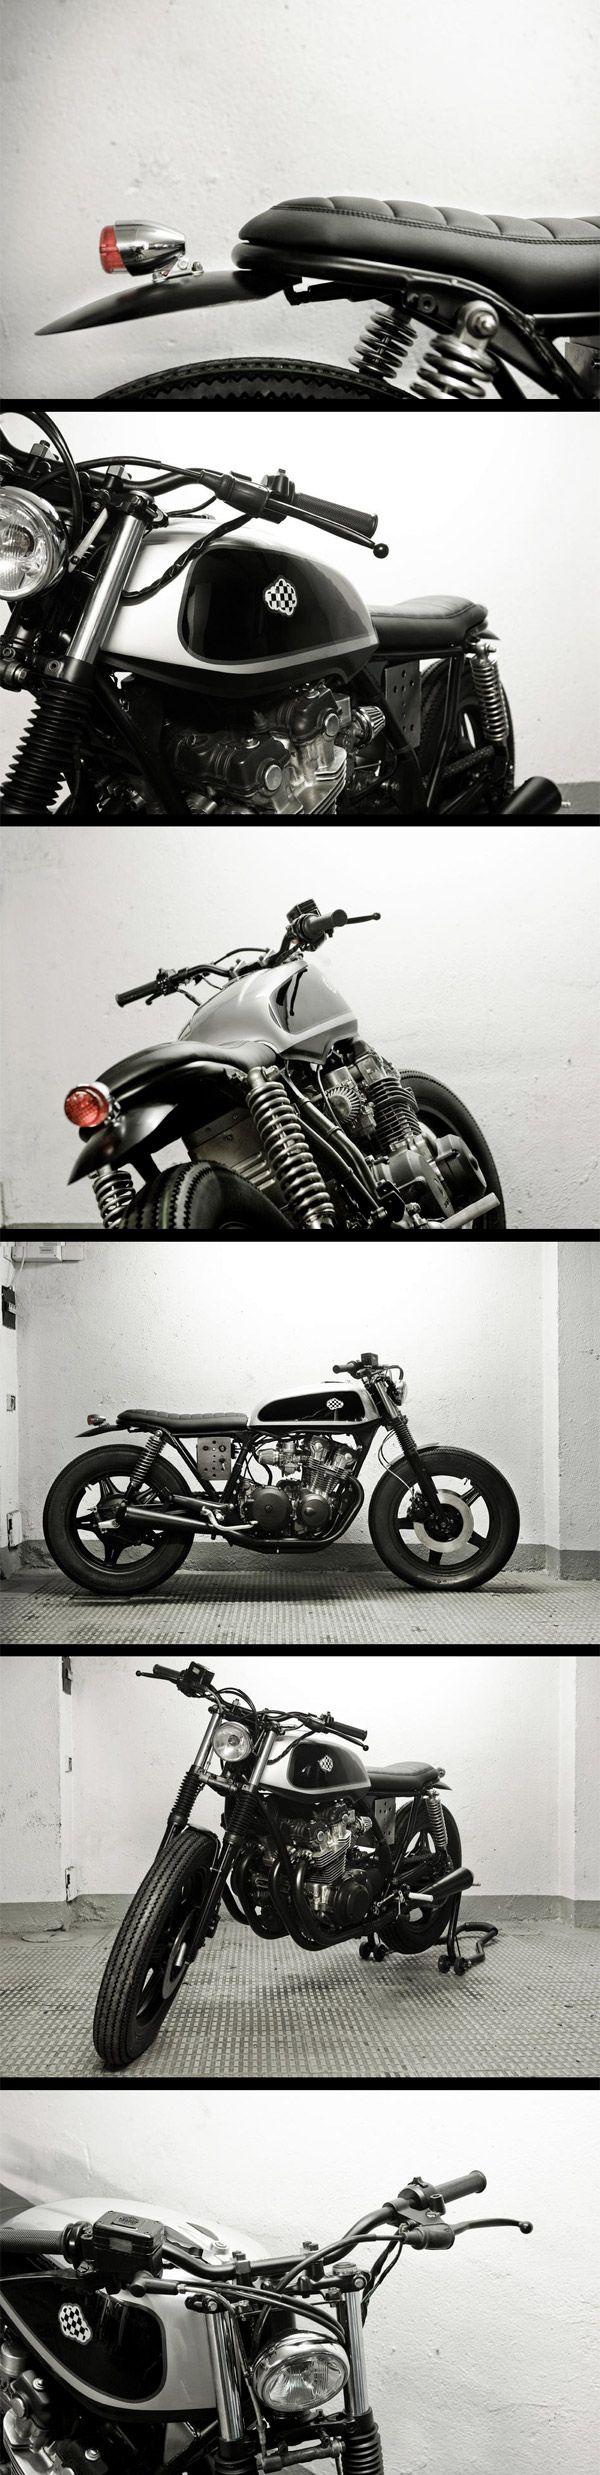 Cafe Racer Dreams : Honda CB 750 kz 1980 bratstyle